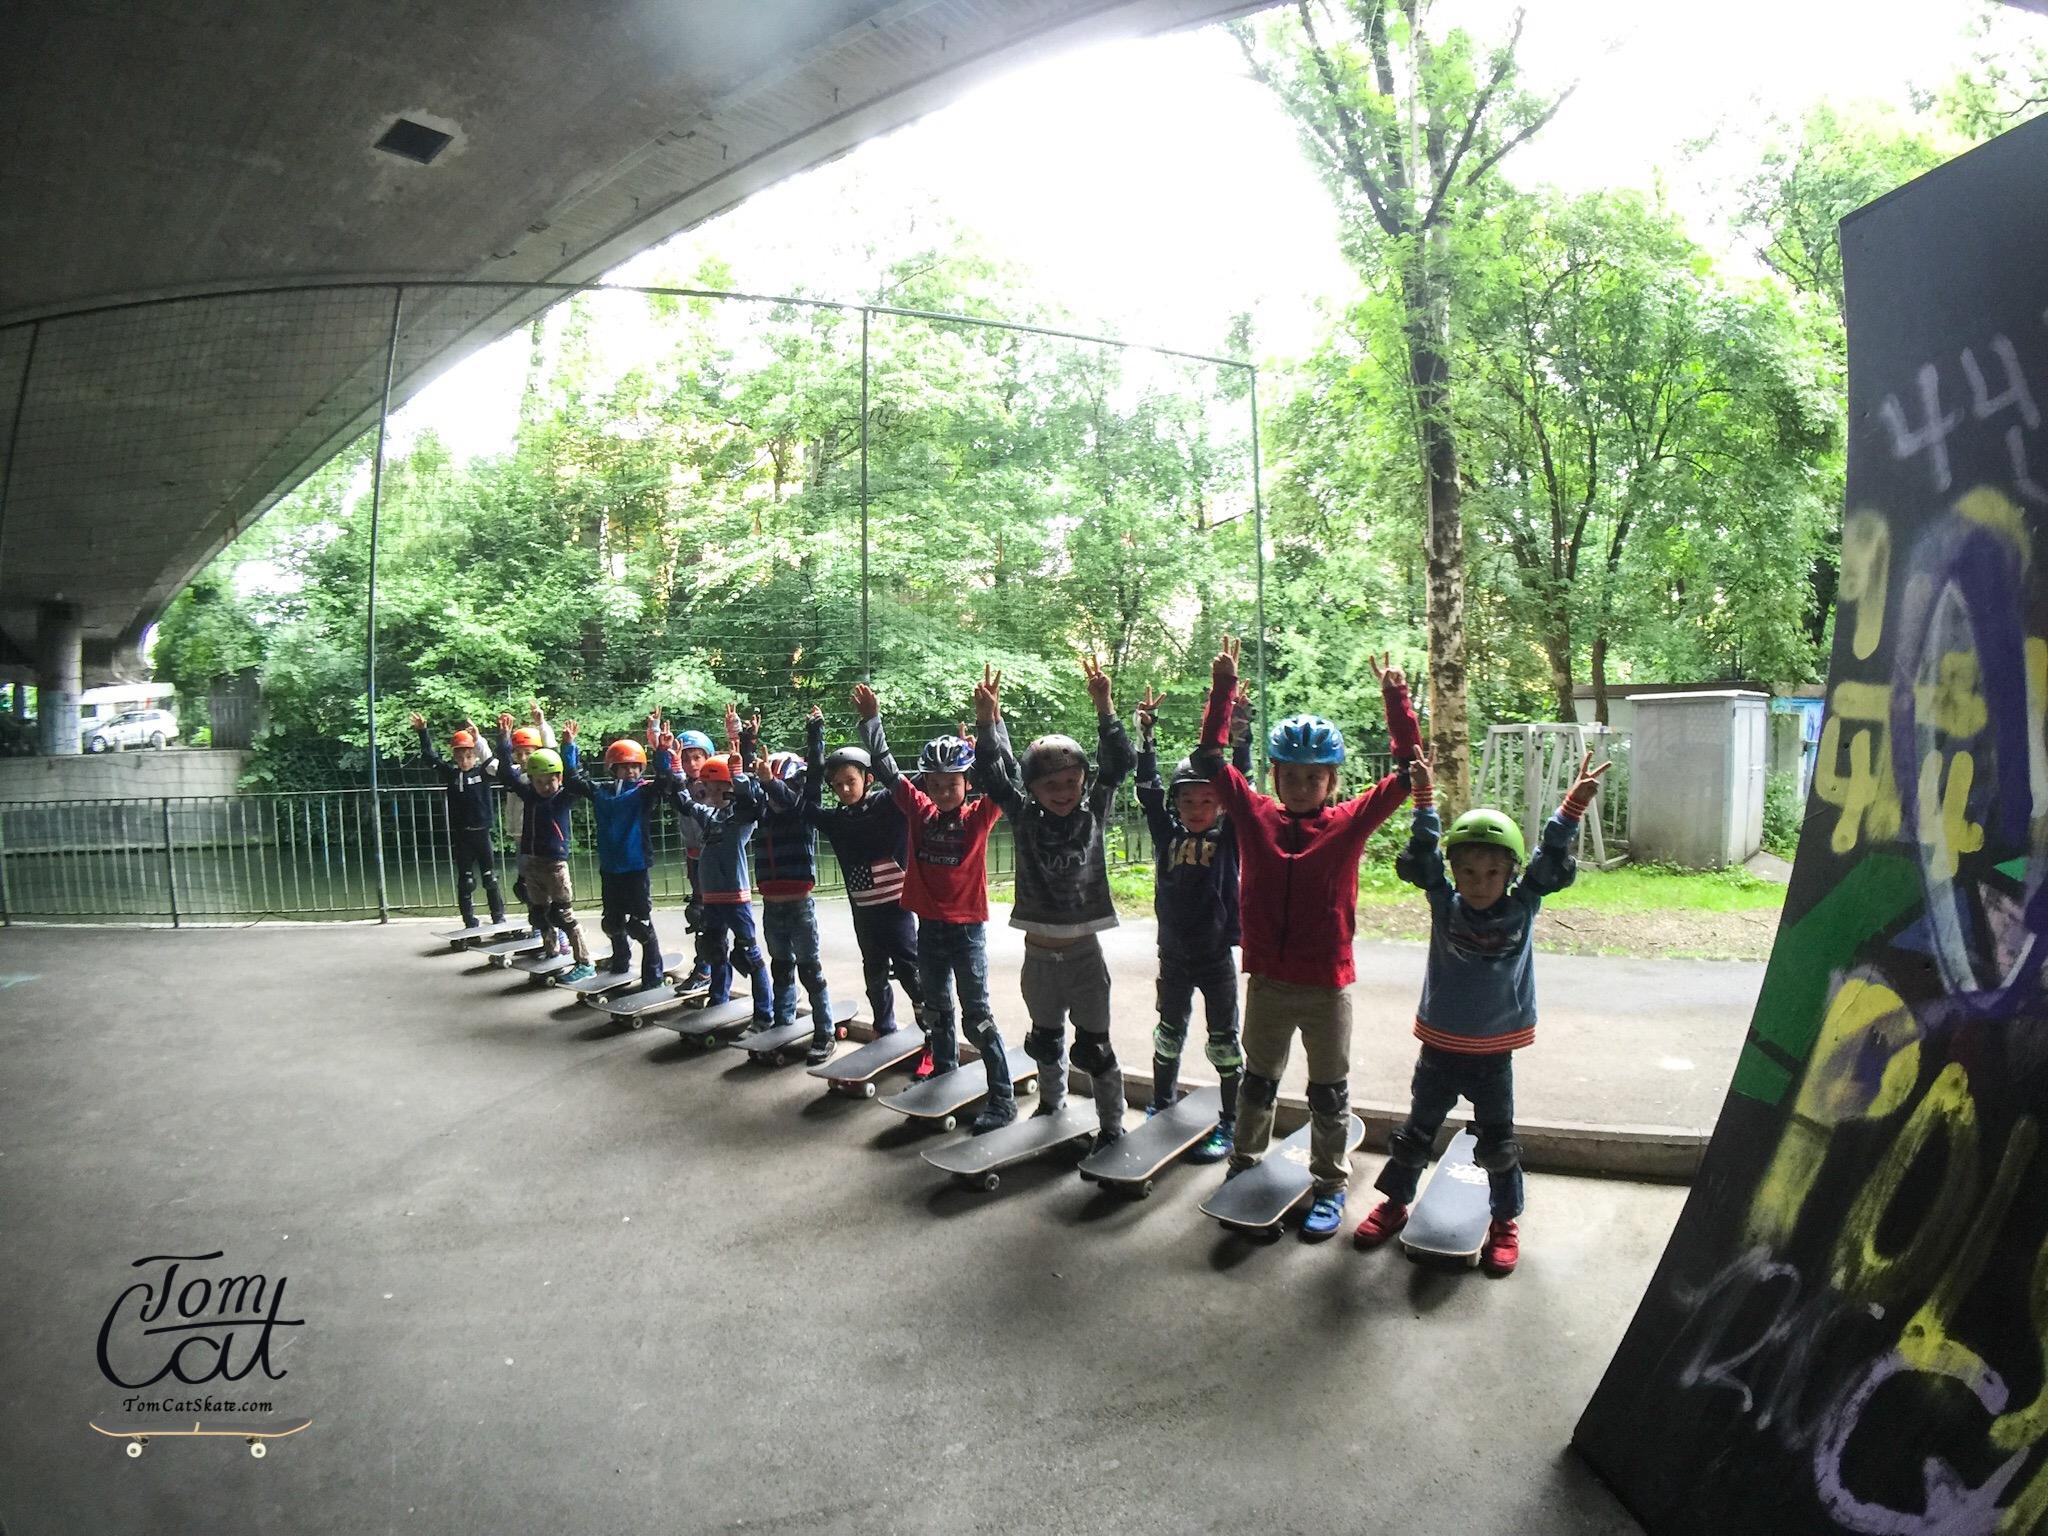 Skateboardkurs München Skatekurs München Longboardkurs für Anfänger und Fortgeschrittene Skateprofi Tom Cat Skateboard kaufen Geretsried Bad Tölz.JPG